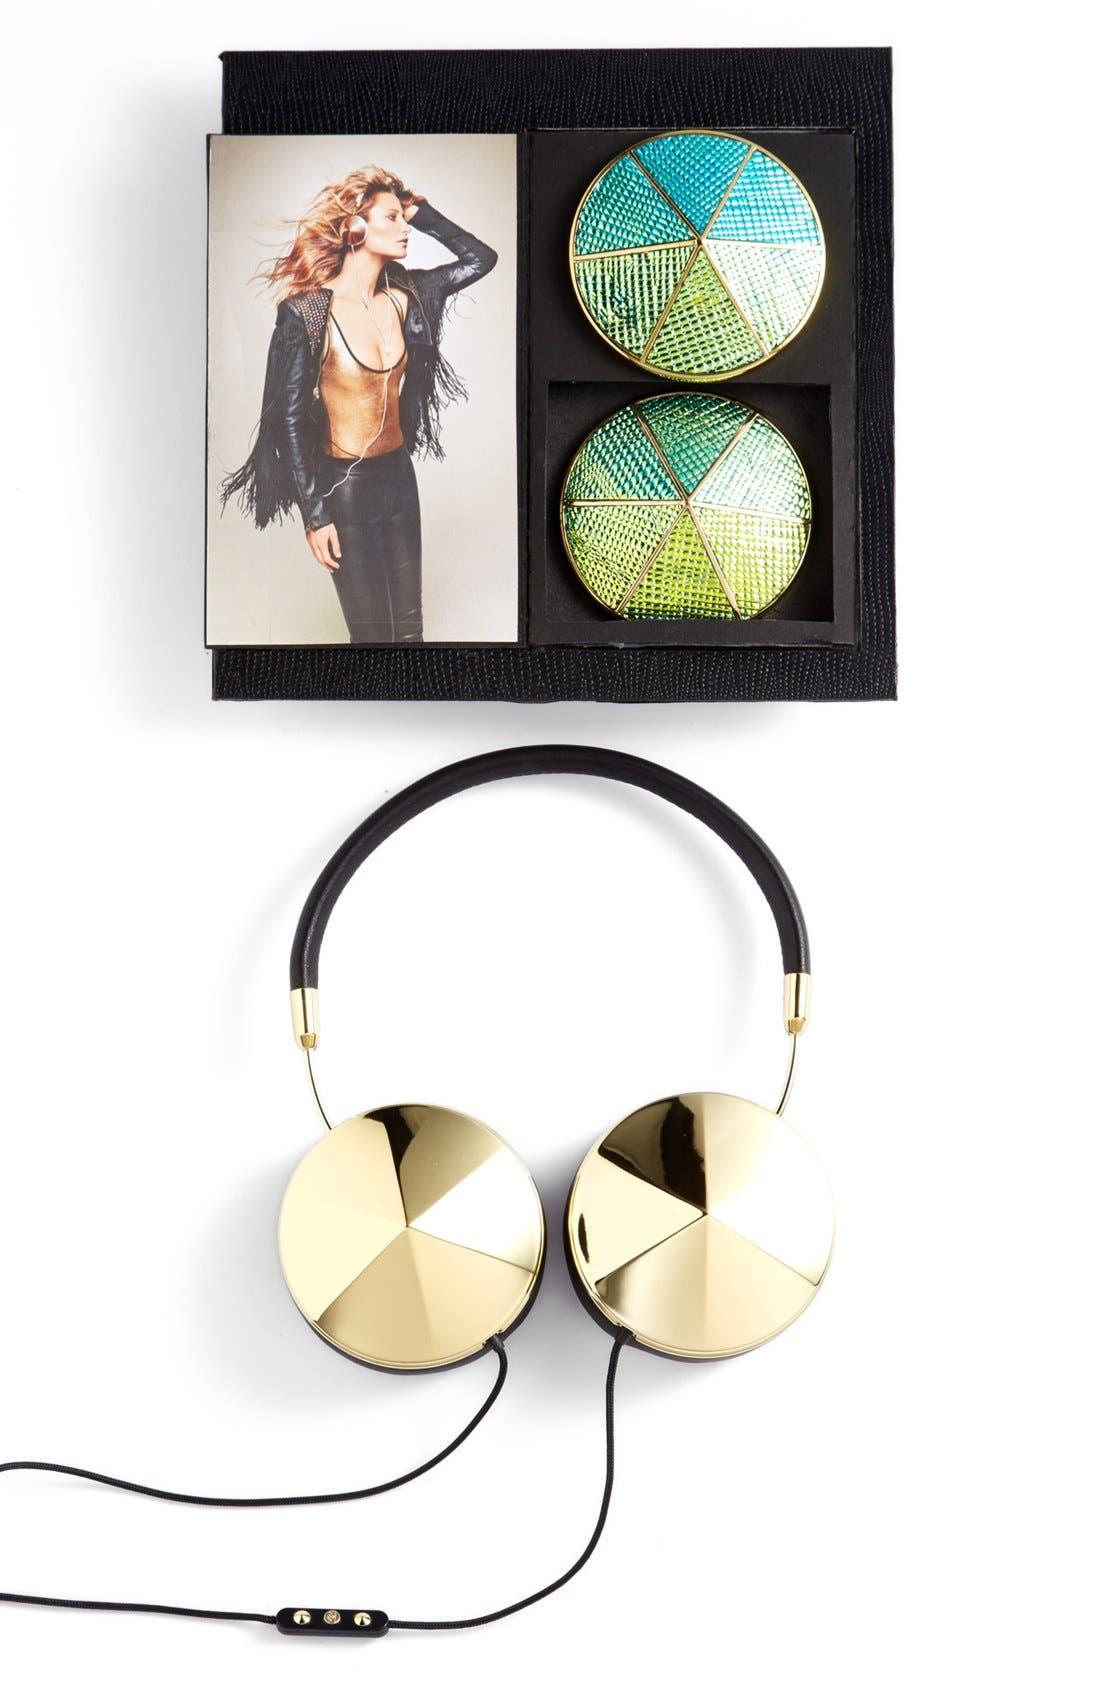 Alternate Image 1 Selected - Frends 'Taylor - Rebecca Minkoff' Headphones